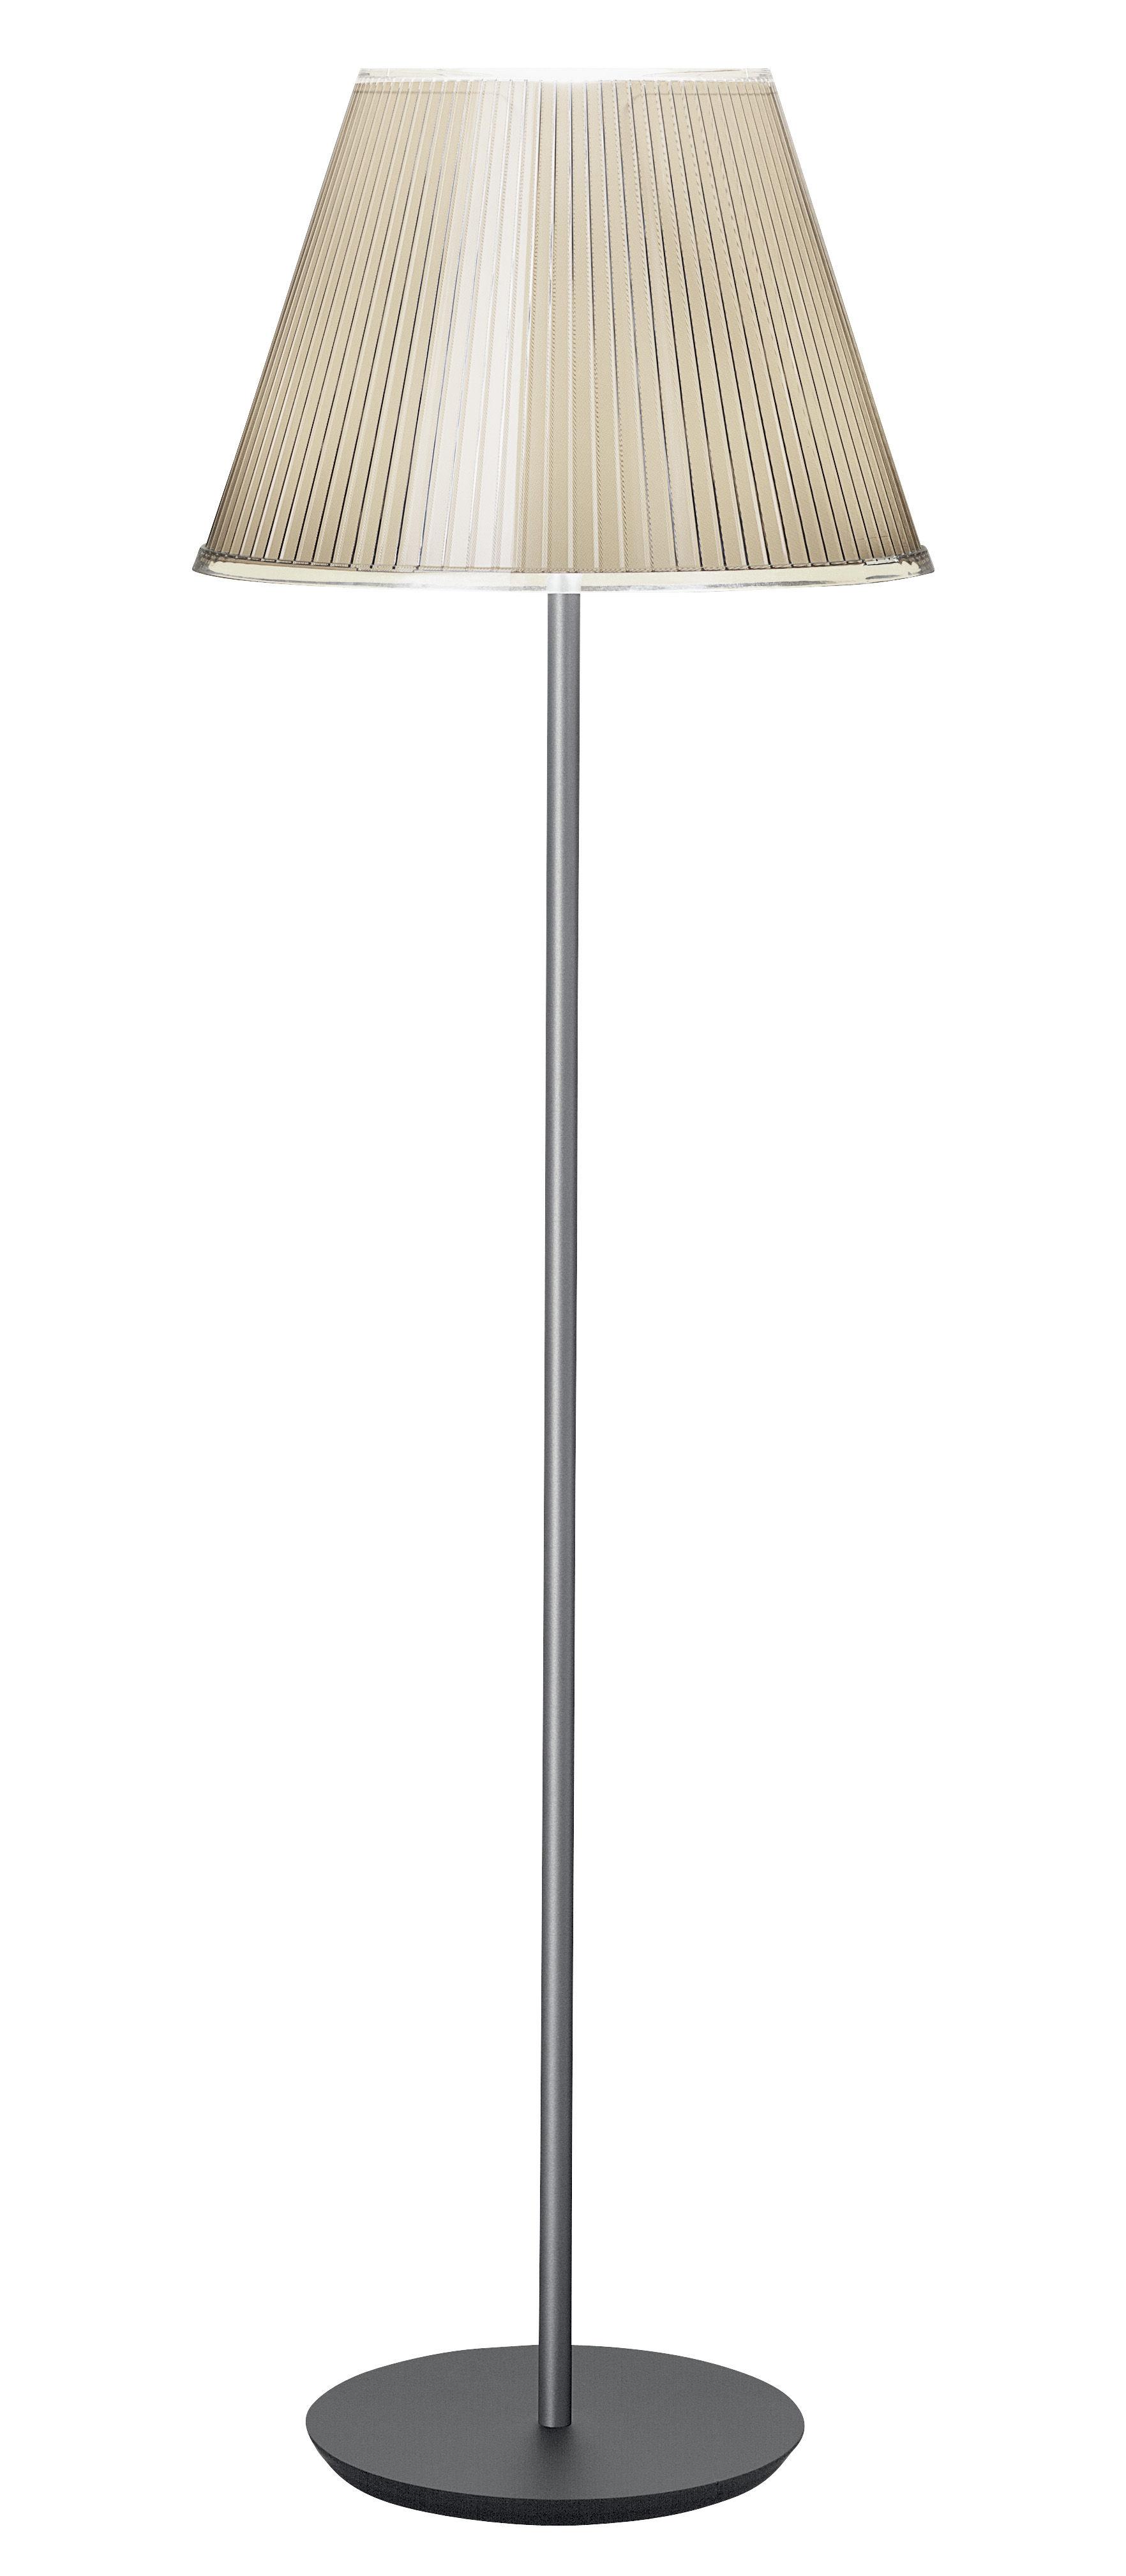 Illuminazione - Lampade da terra - Lampada a stelo Choose di Artemide - Beige / Incandescente - Carta pergamena, Metallo, policarbonato